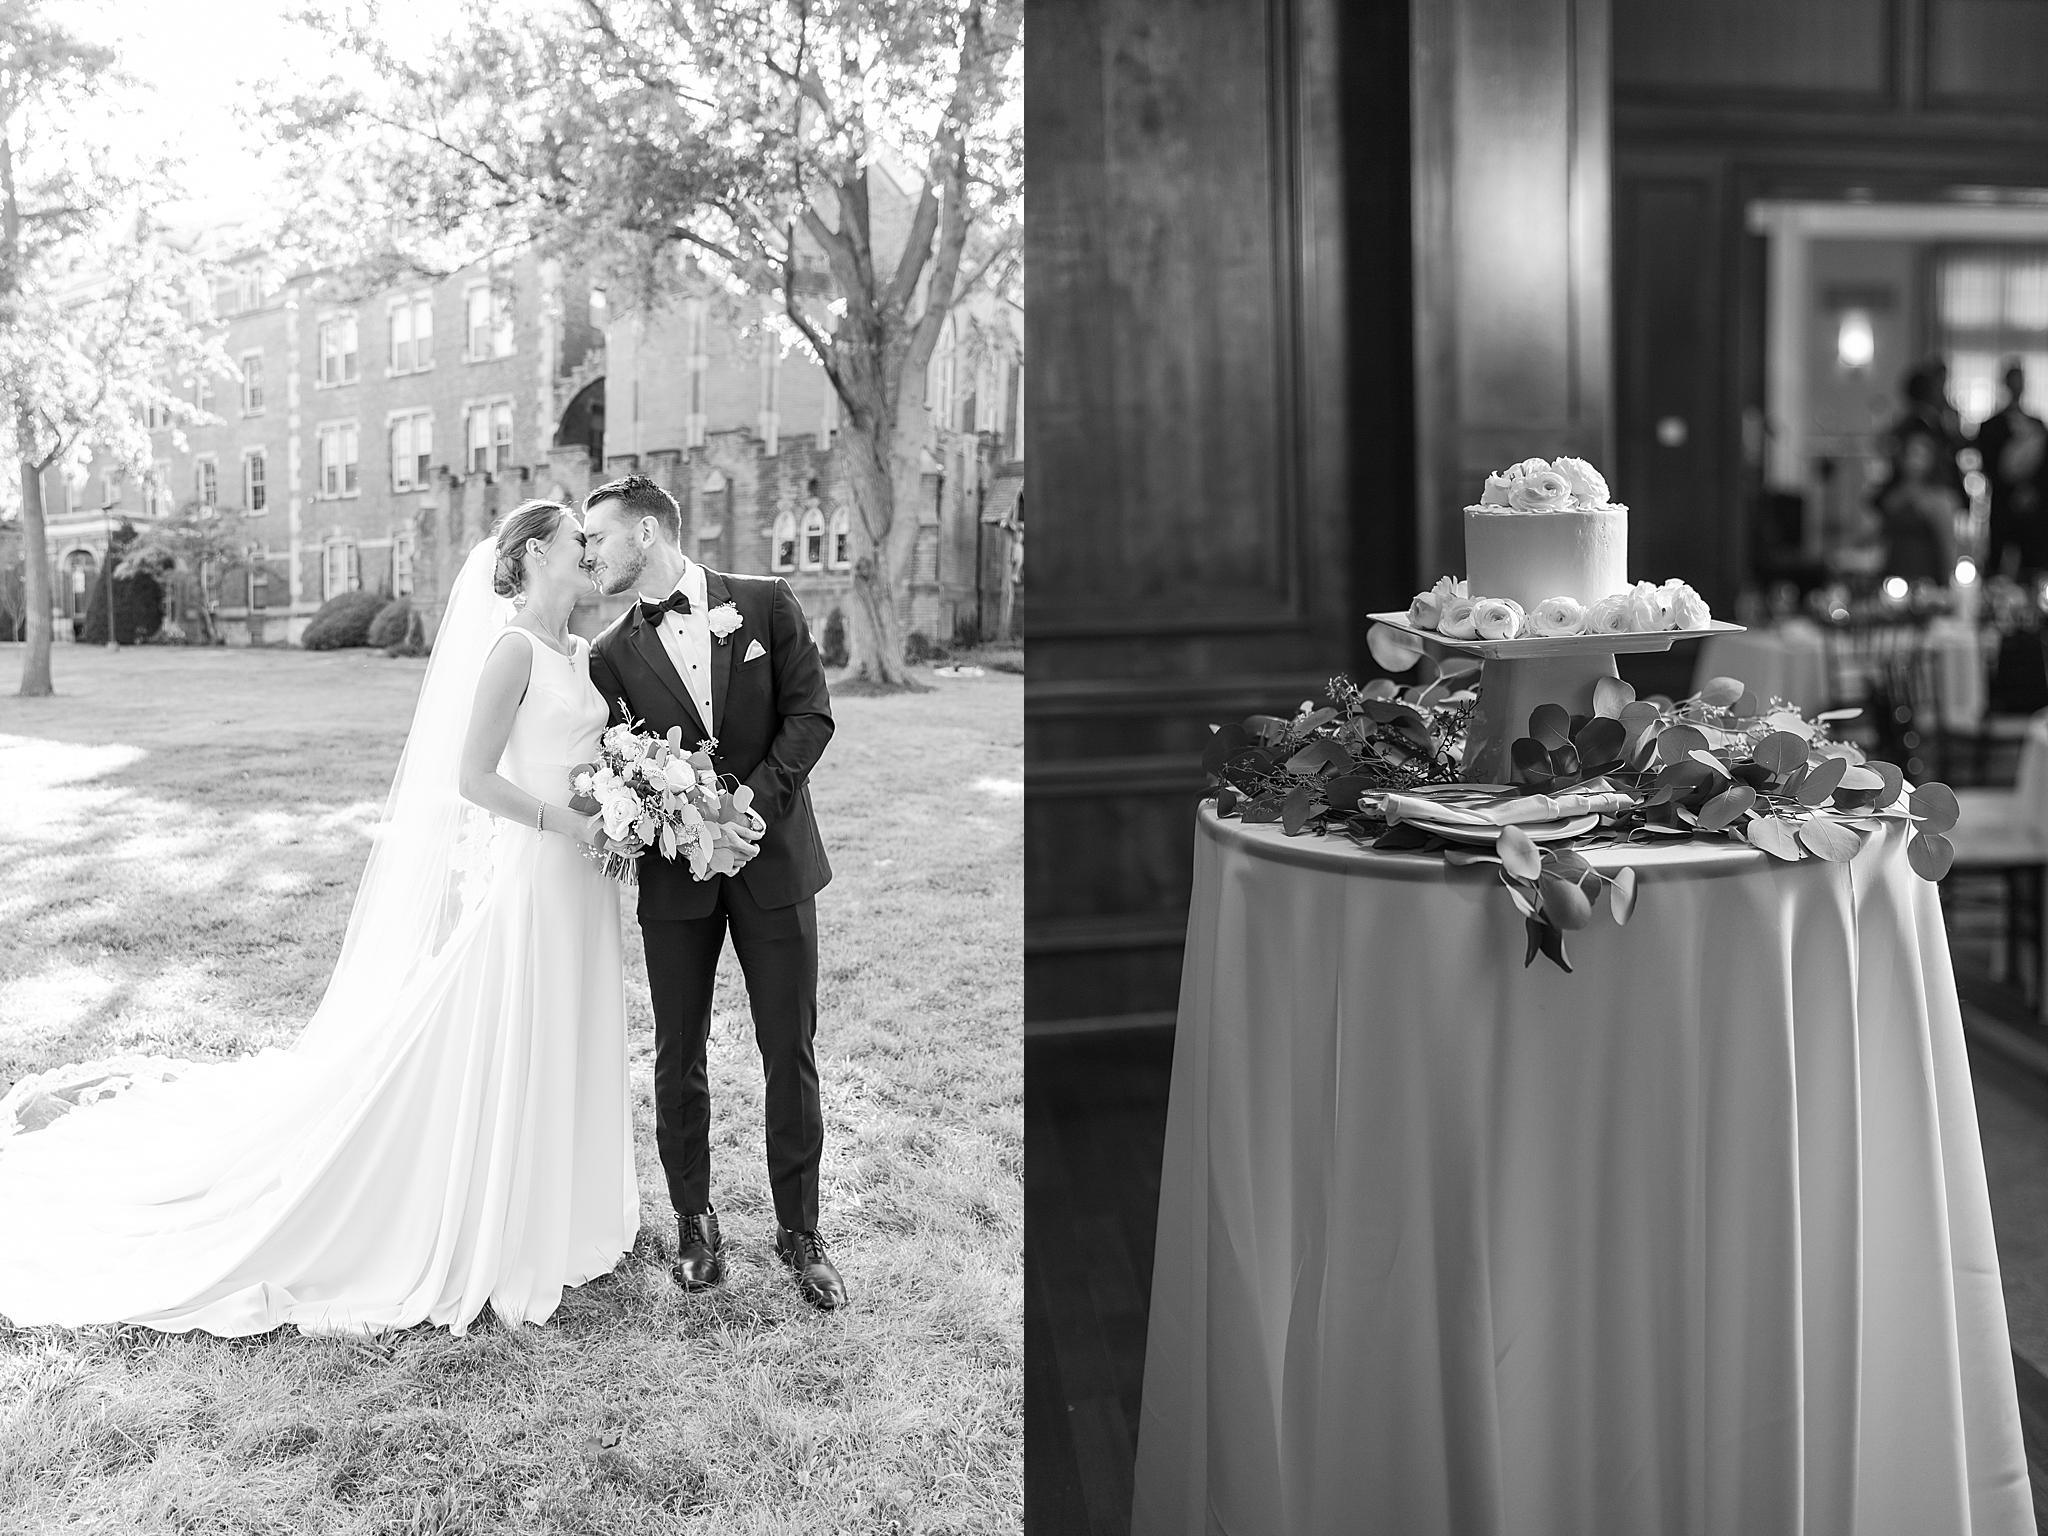 detroit-wedding-photographer-grosse-pointe-academy-chapel-detroit-golf-club-wedding-carly-matt-by-courtney-carolyn-photography_0079.jpg